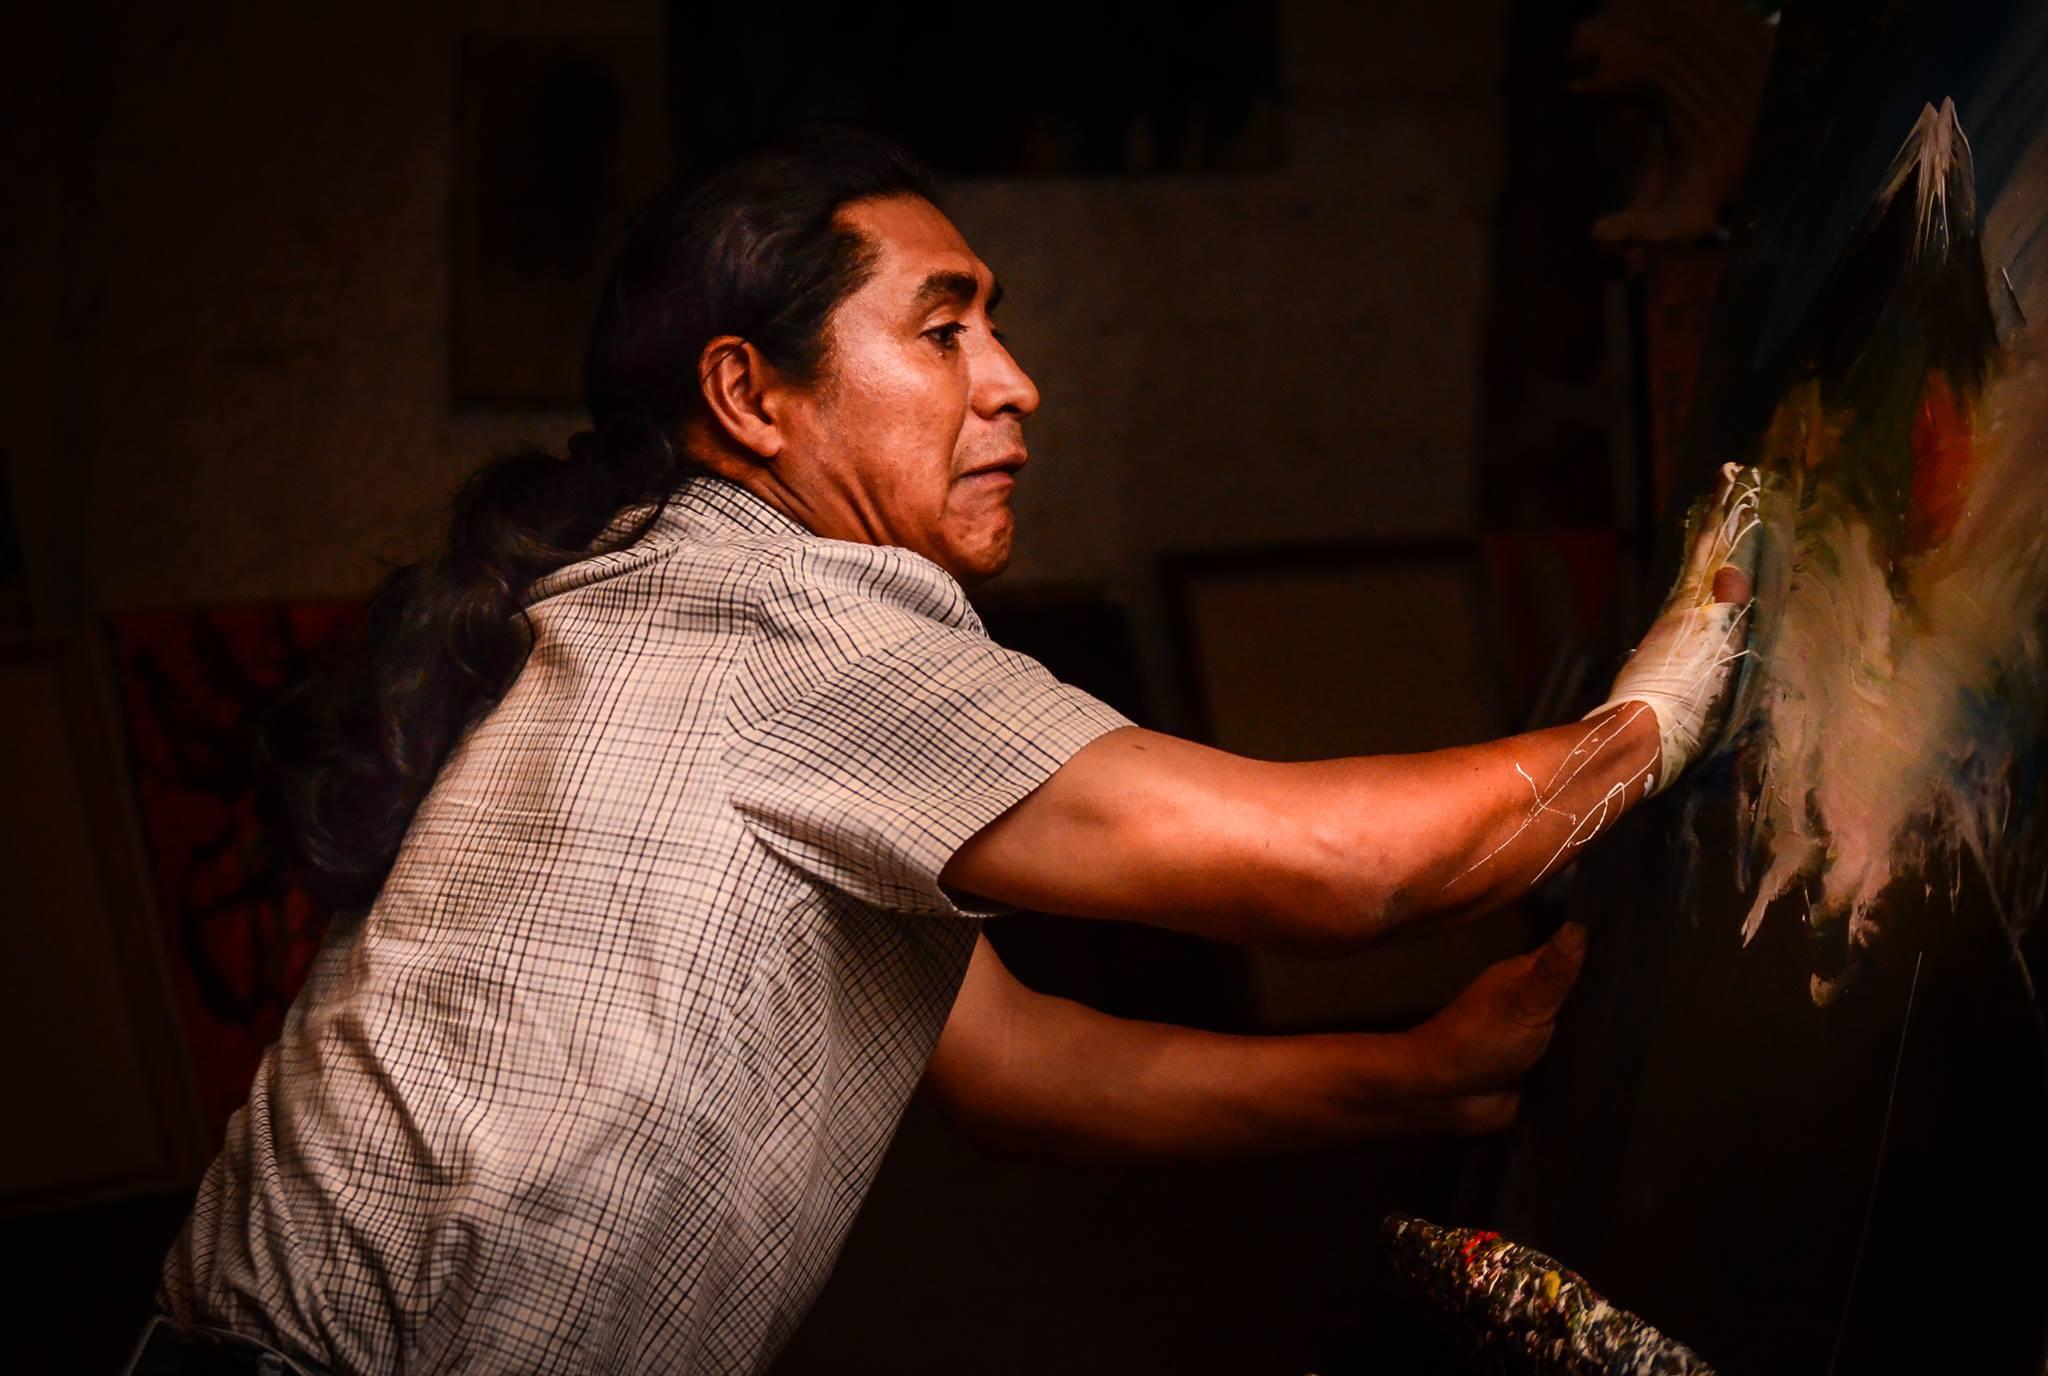 Go to Famous Artist Painter Ortega Maila's profile